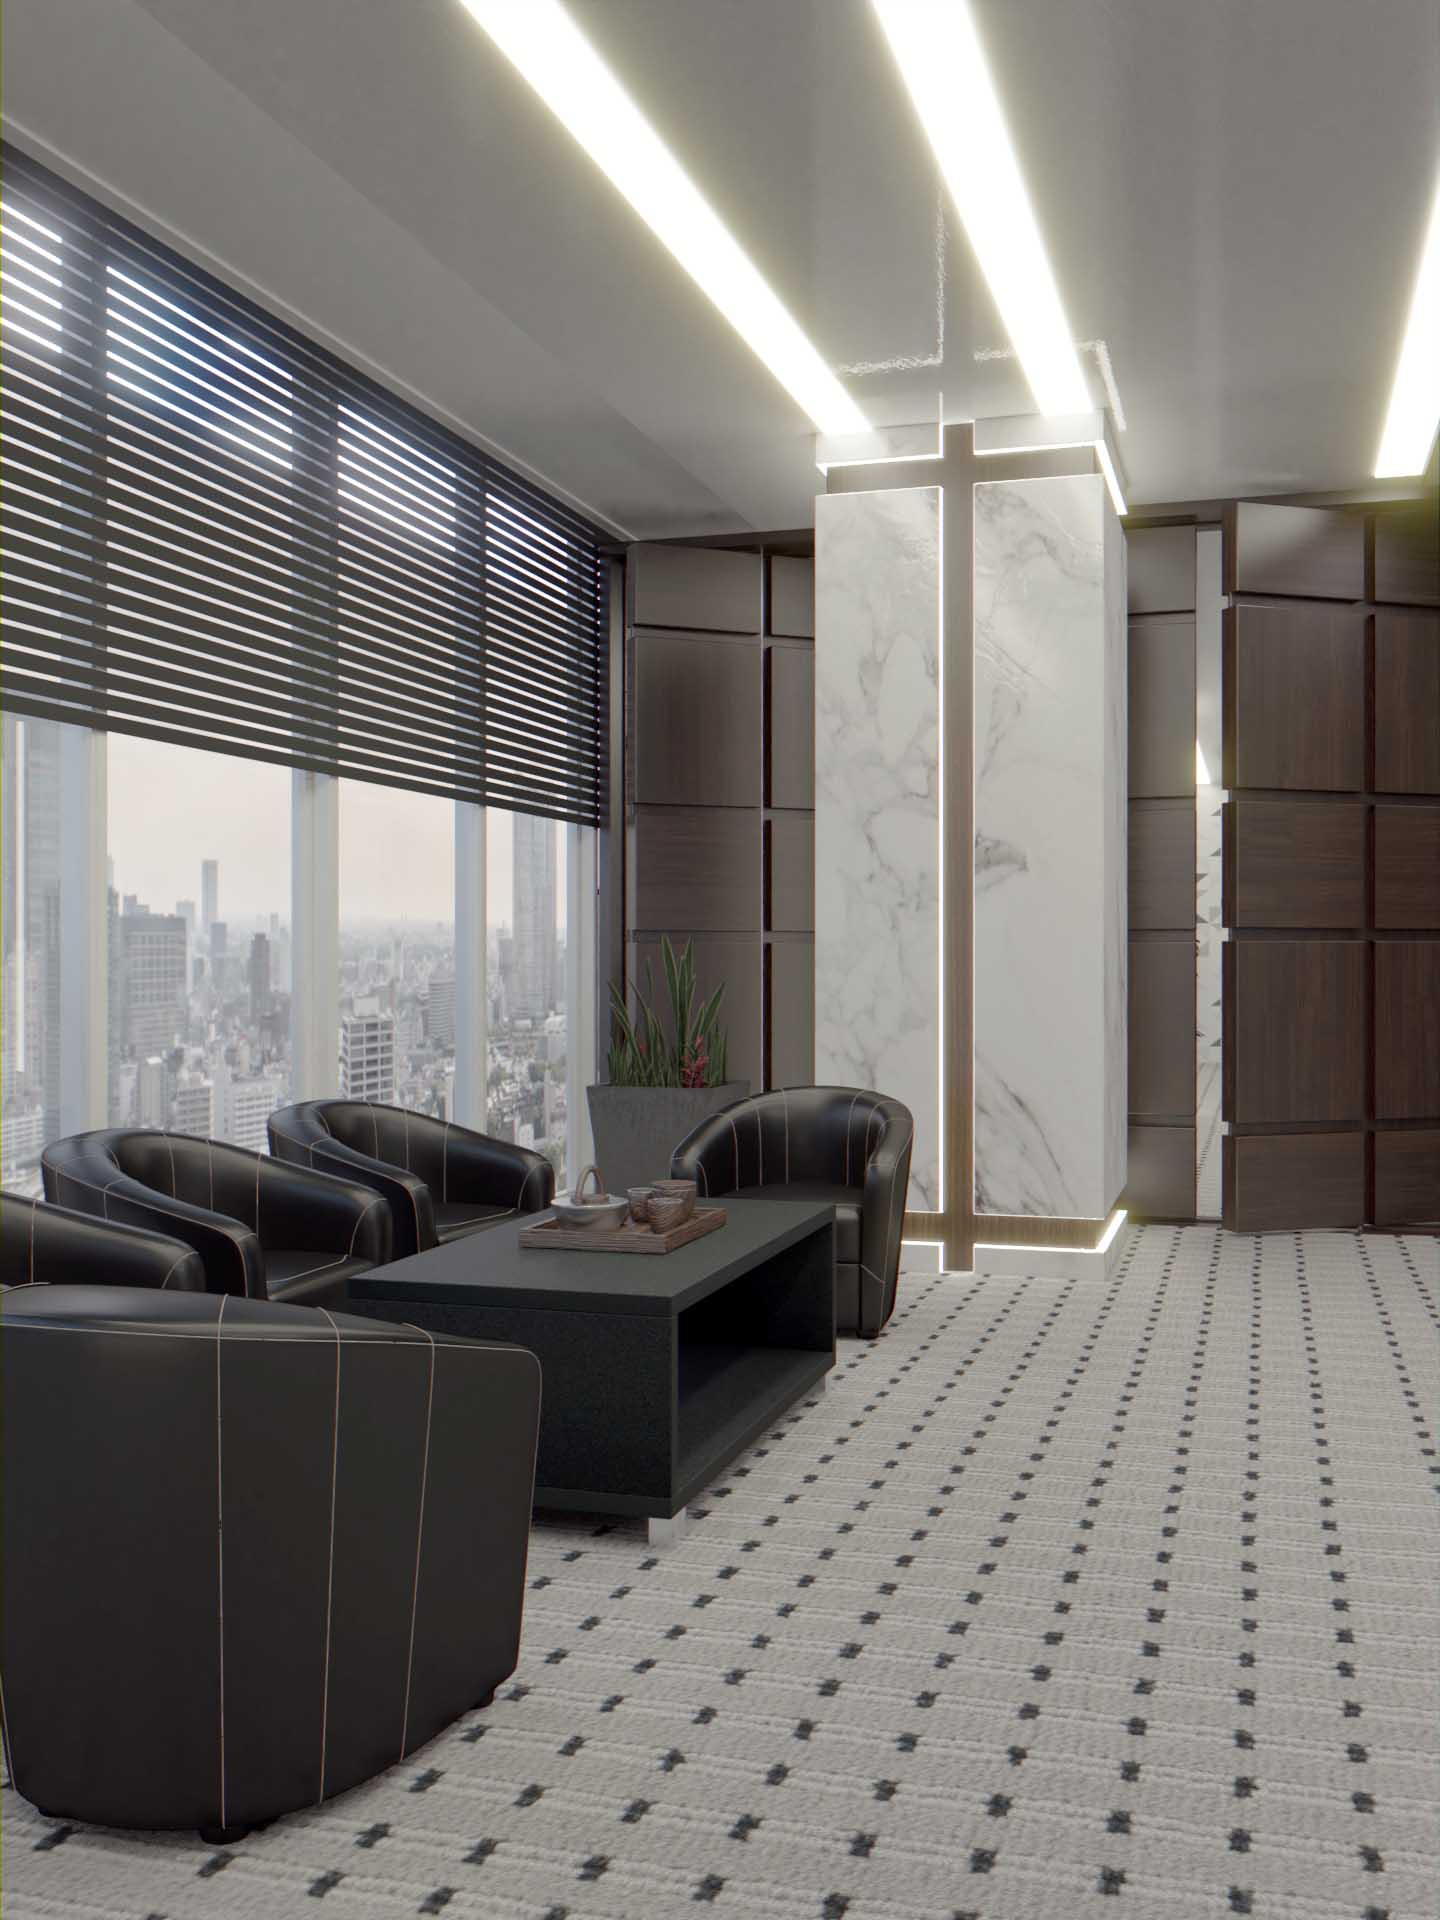 Lounge_Ramco_Serenity interiors